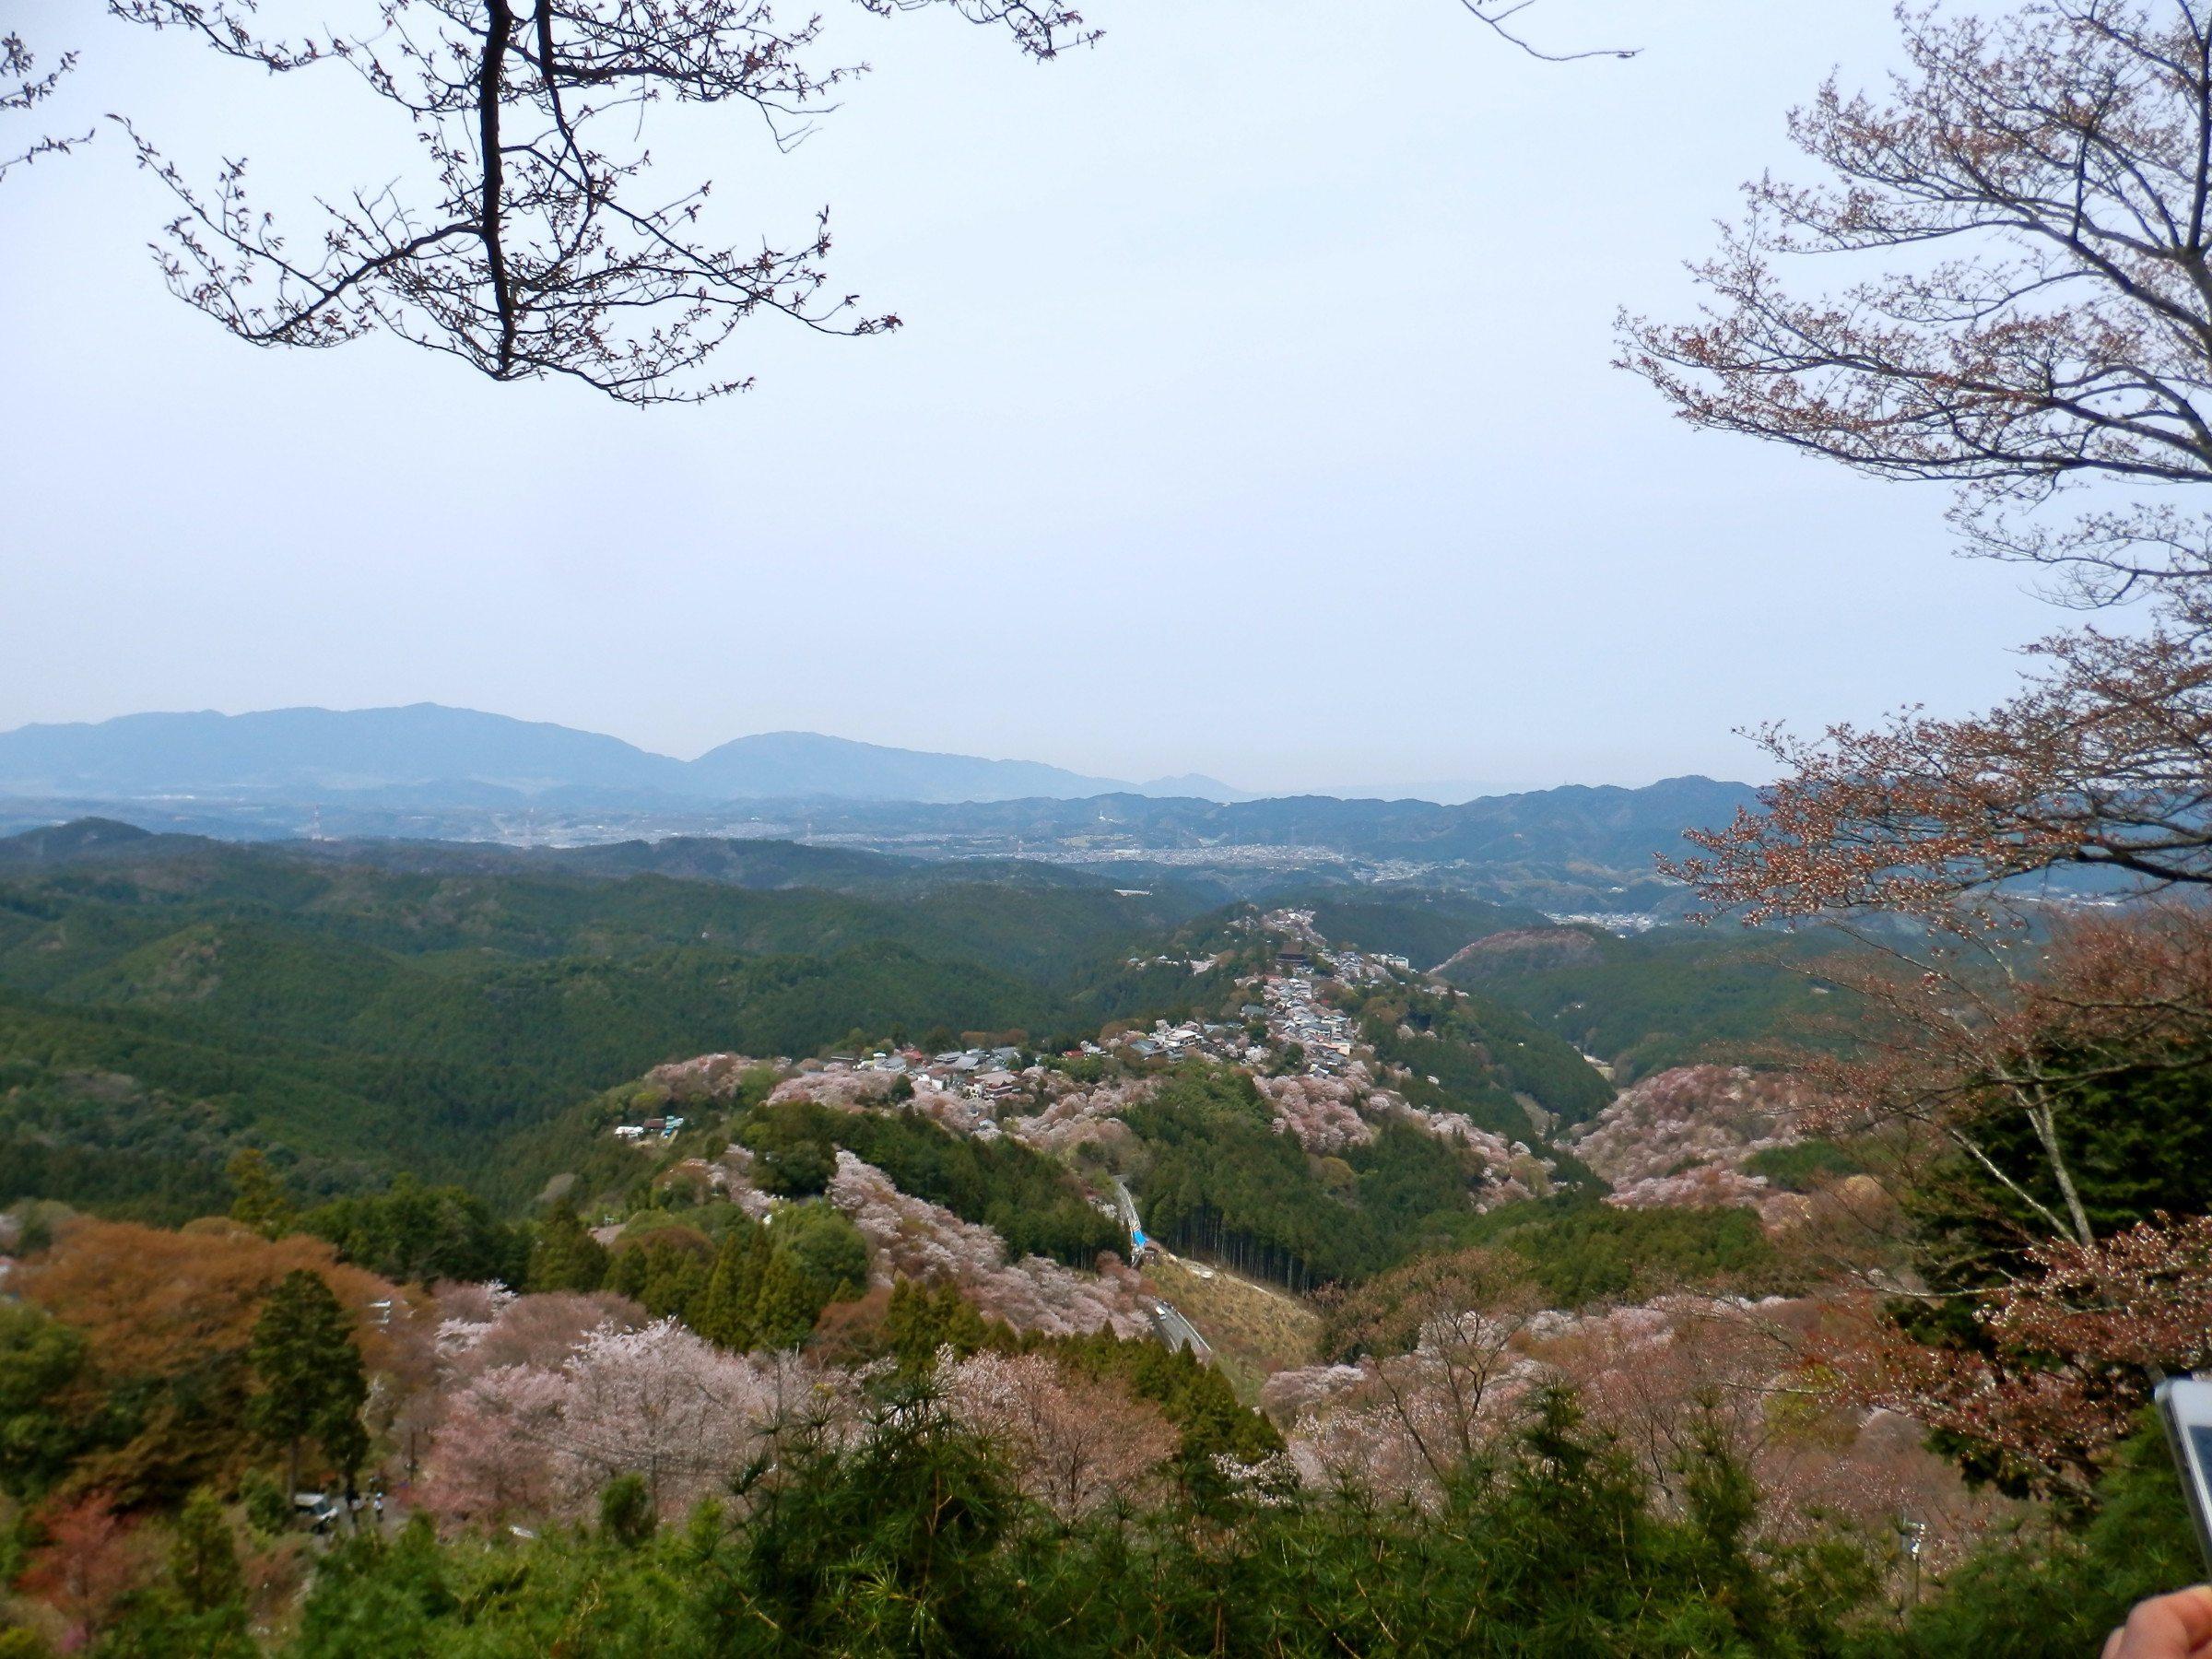 View from the Hanayagura Viewpoint